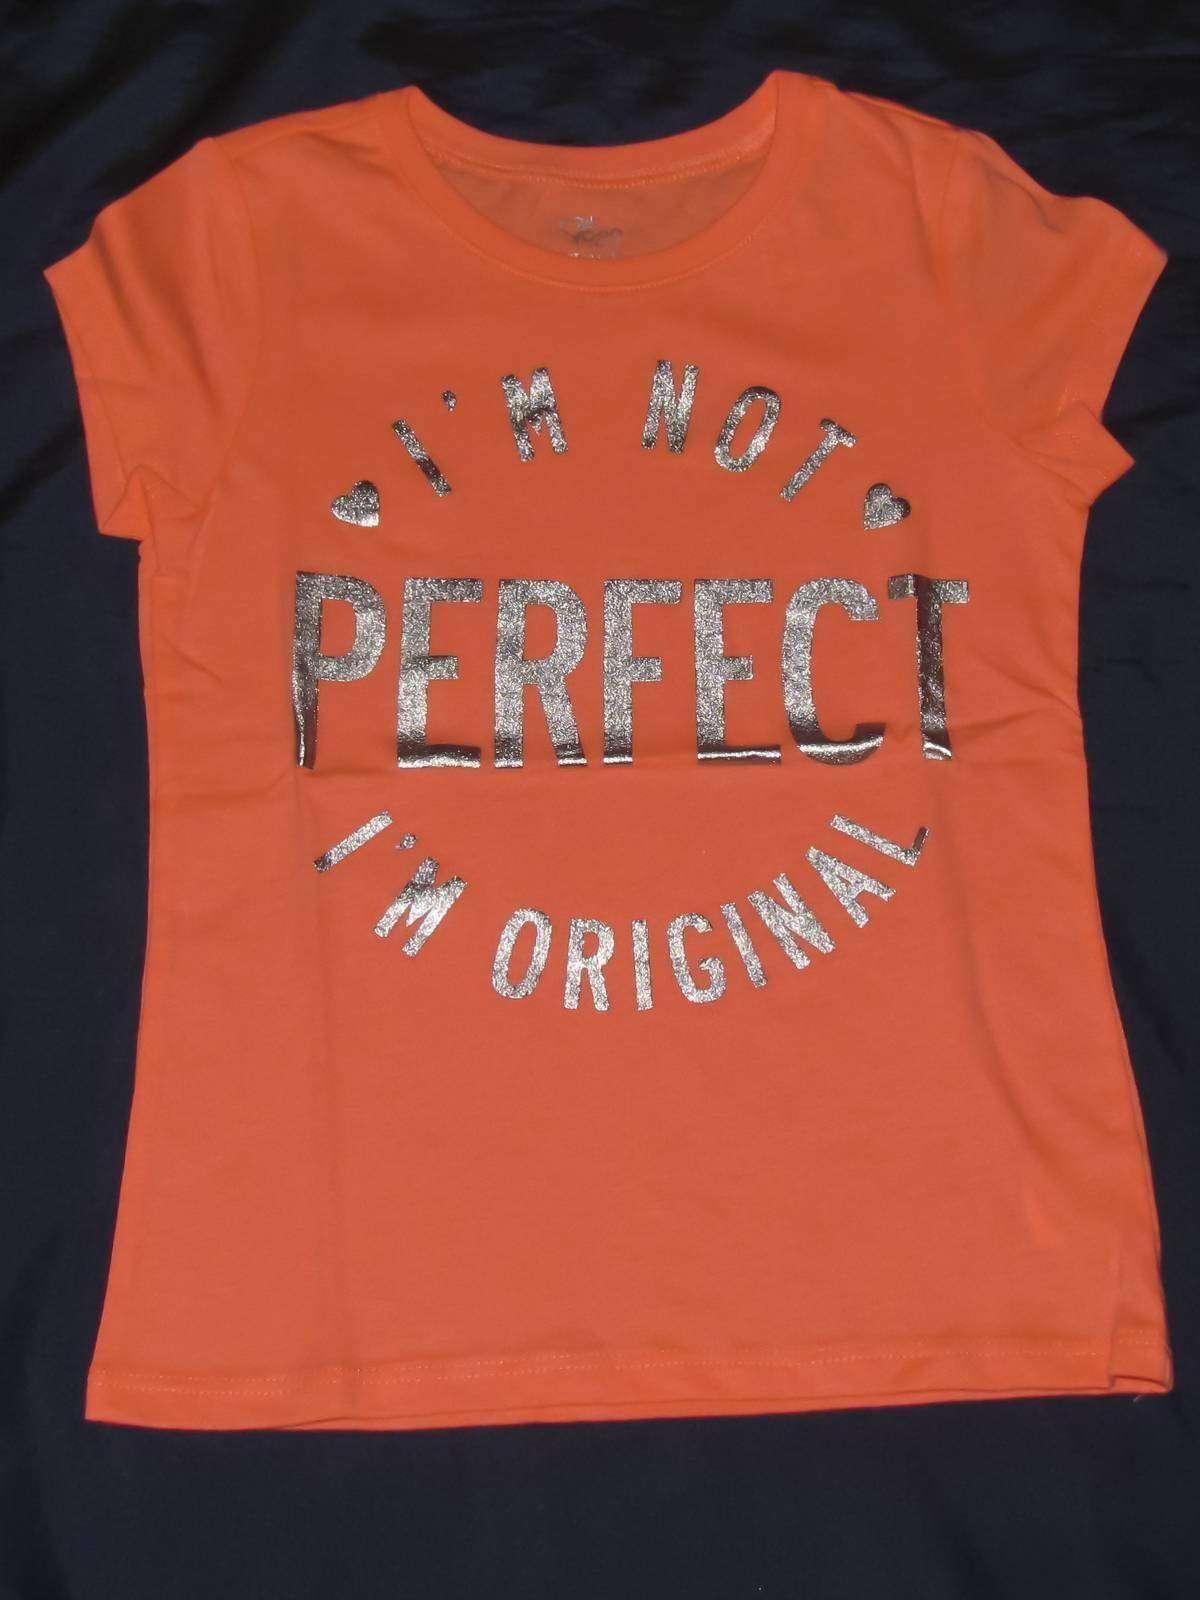 Childrens Place: Я не идеальна, я оригинальна!